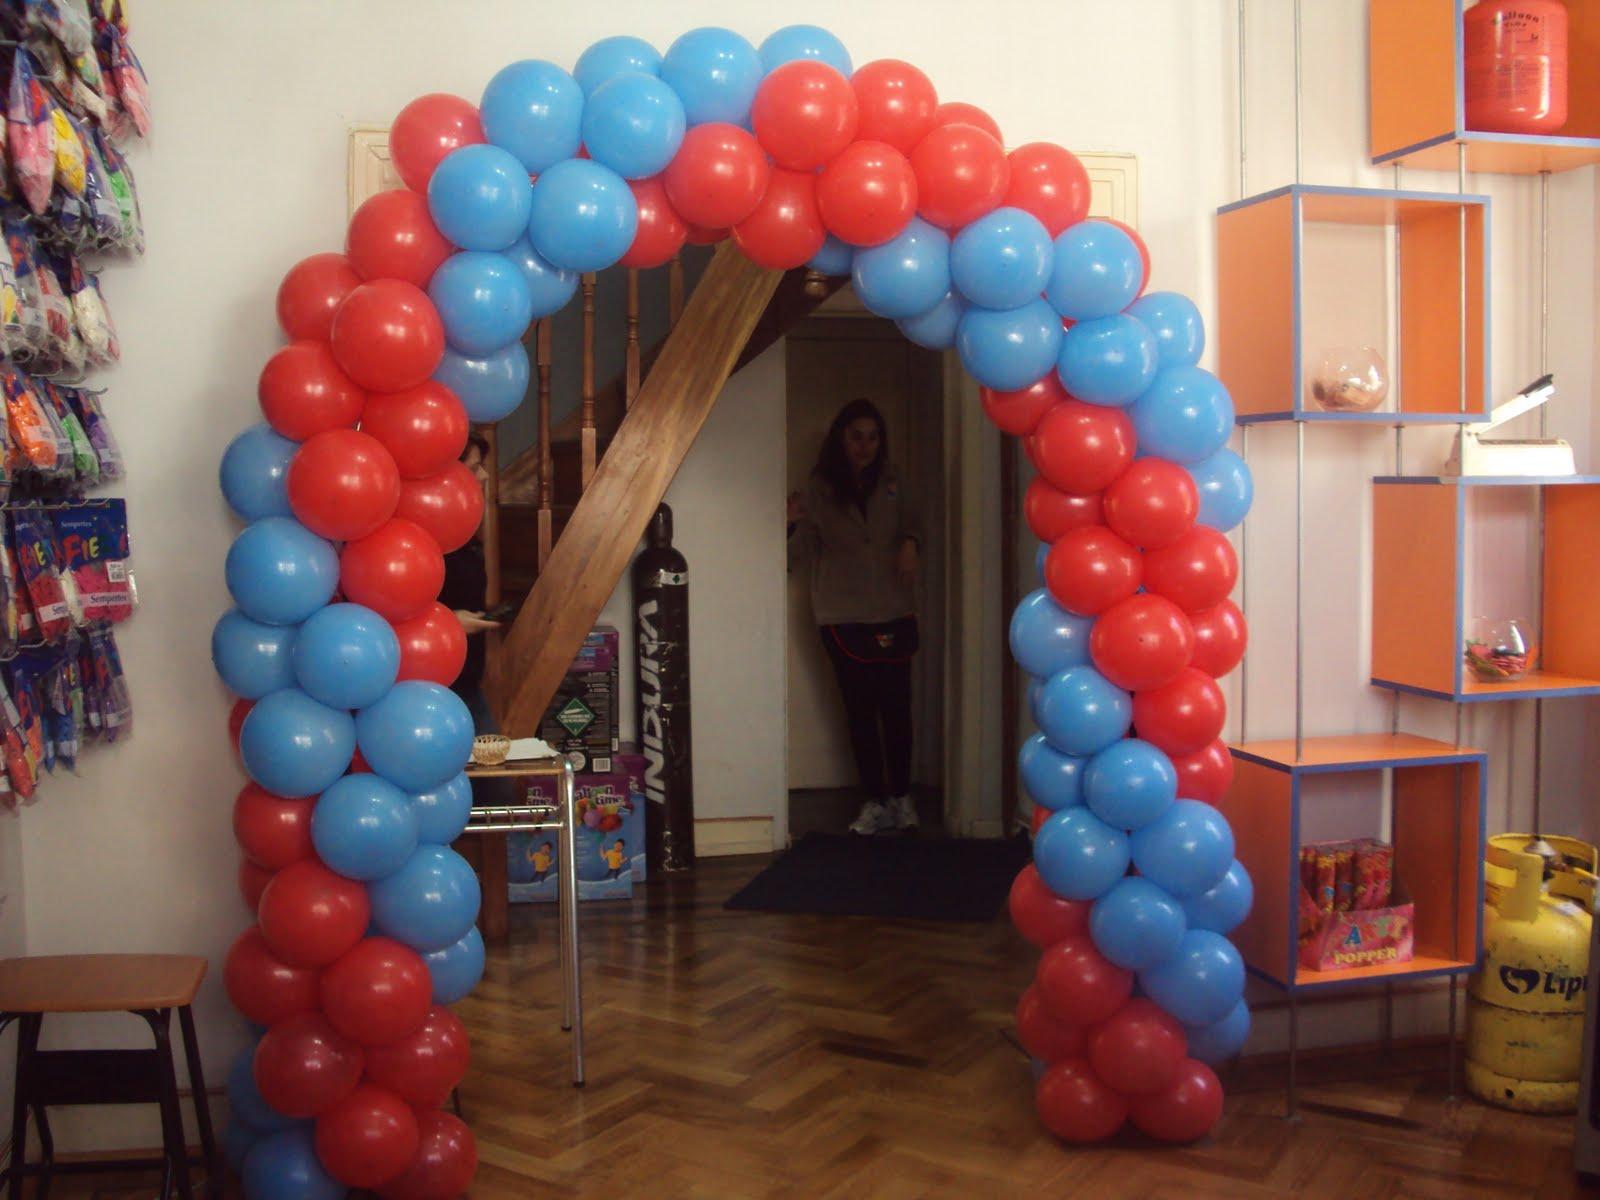 Decora tu fiesta con globos servicios - Decora con globos ...